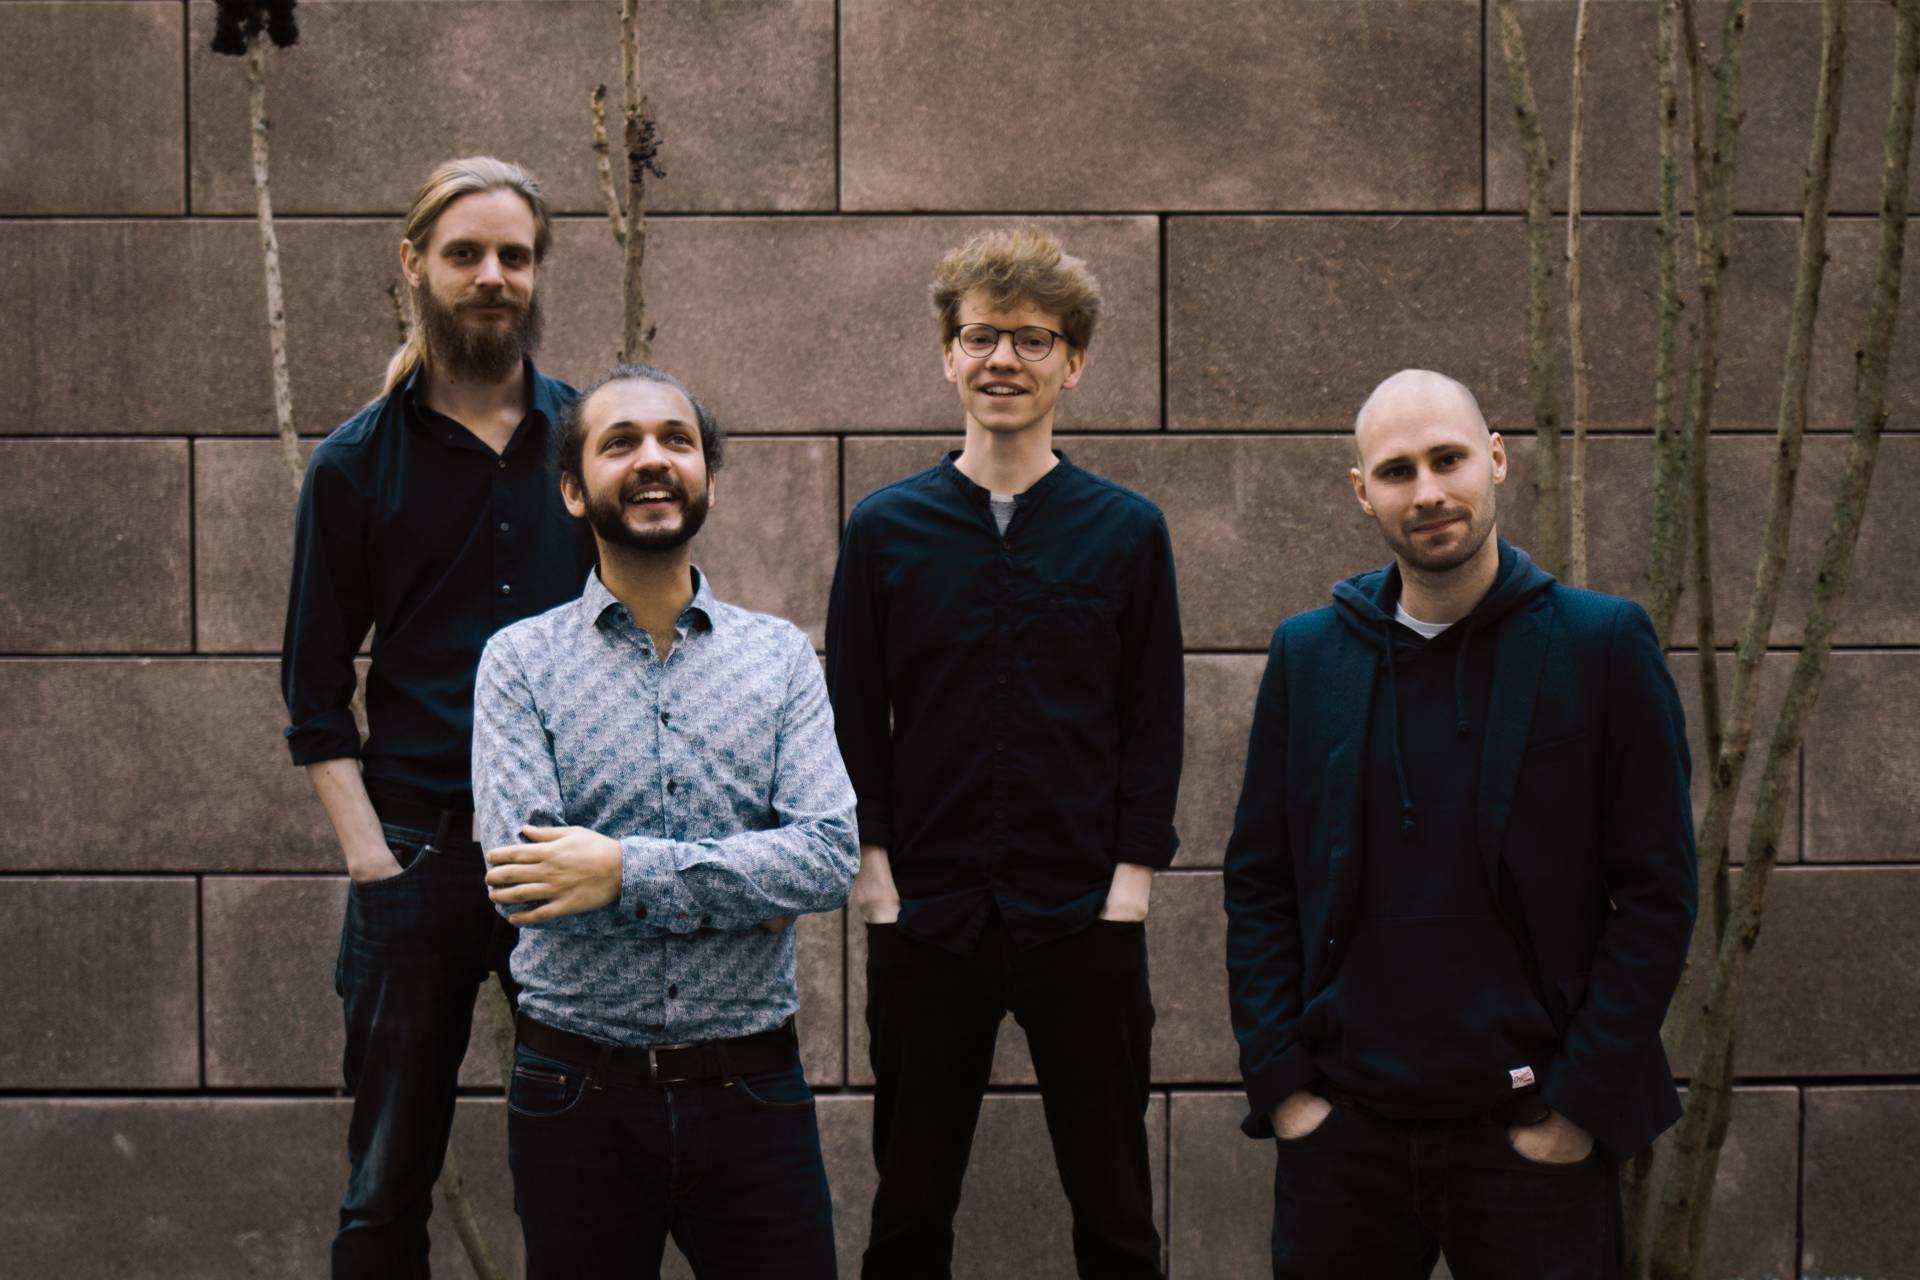 David Soyza Quartett Michael Schumacher Stephan Goldbach Florian Fischer Band Deutschland Osterreich Musiker 14